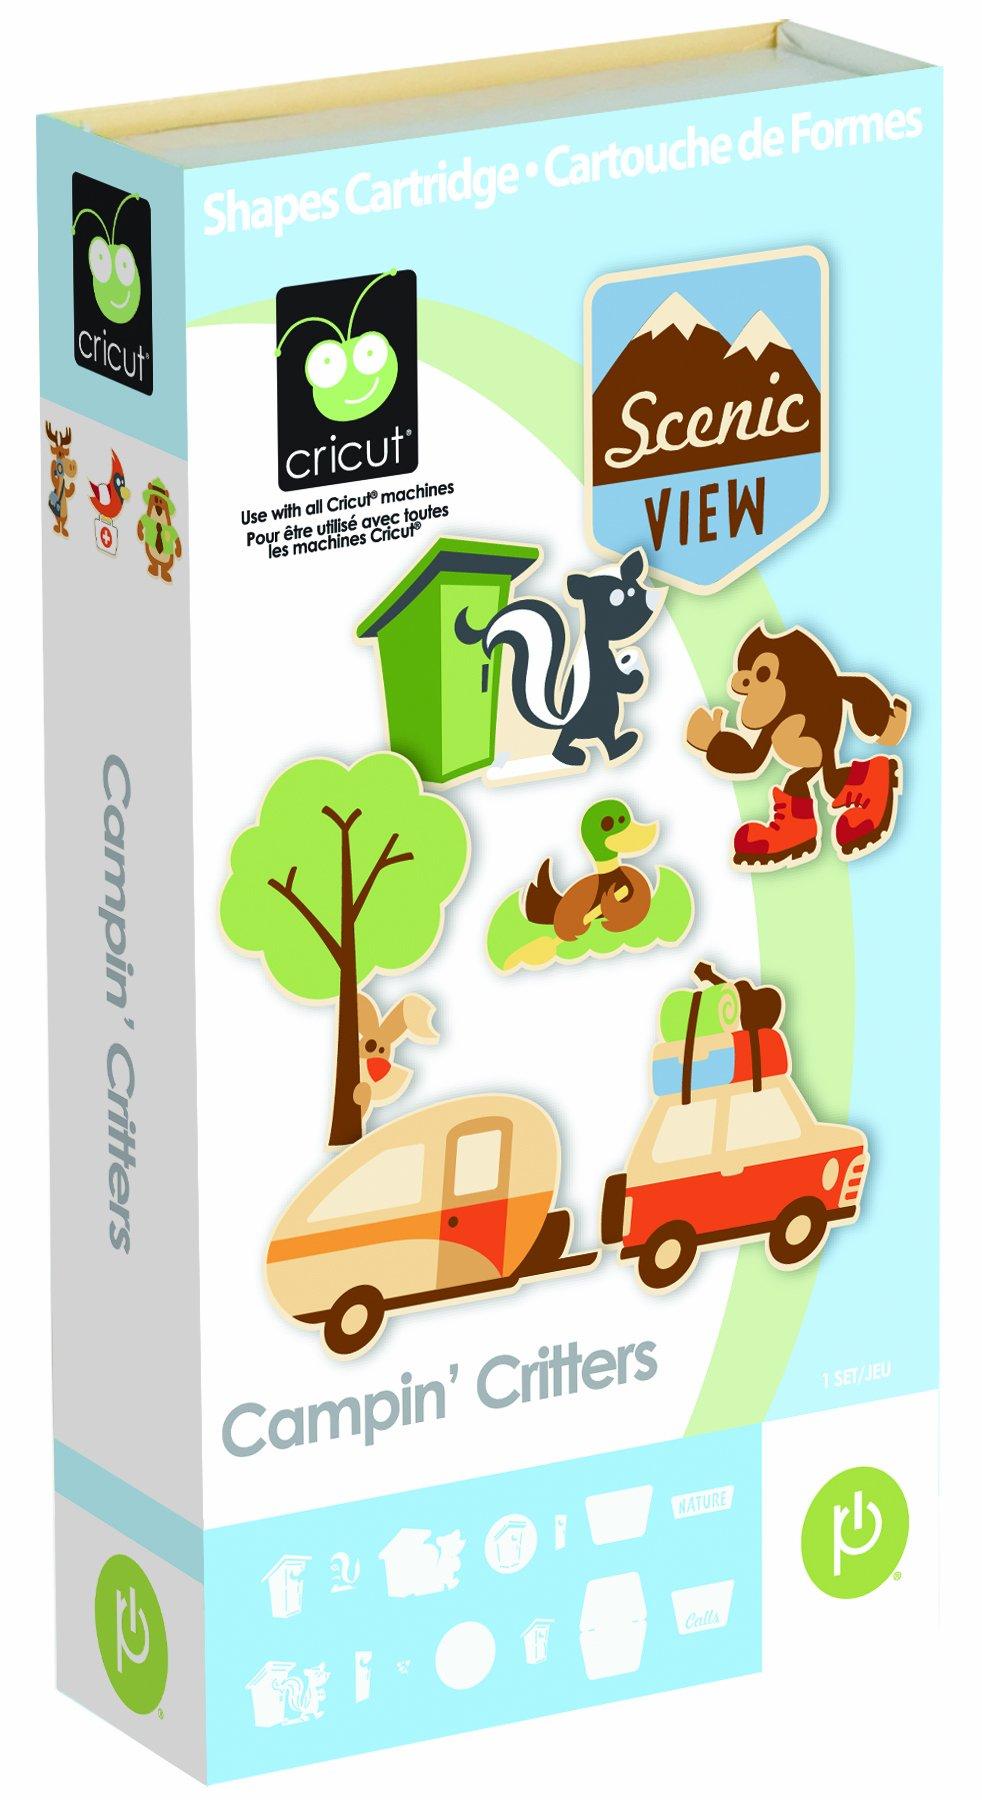 Cricut 2000933 Campin' Critters Cartridge